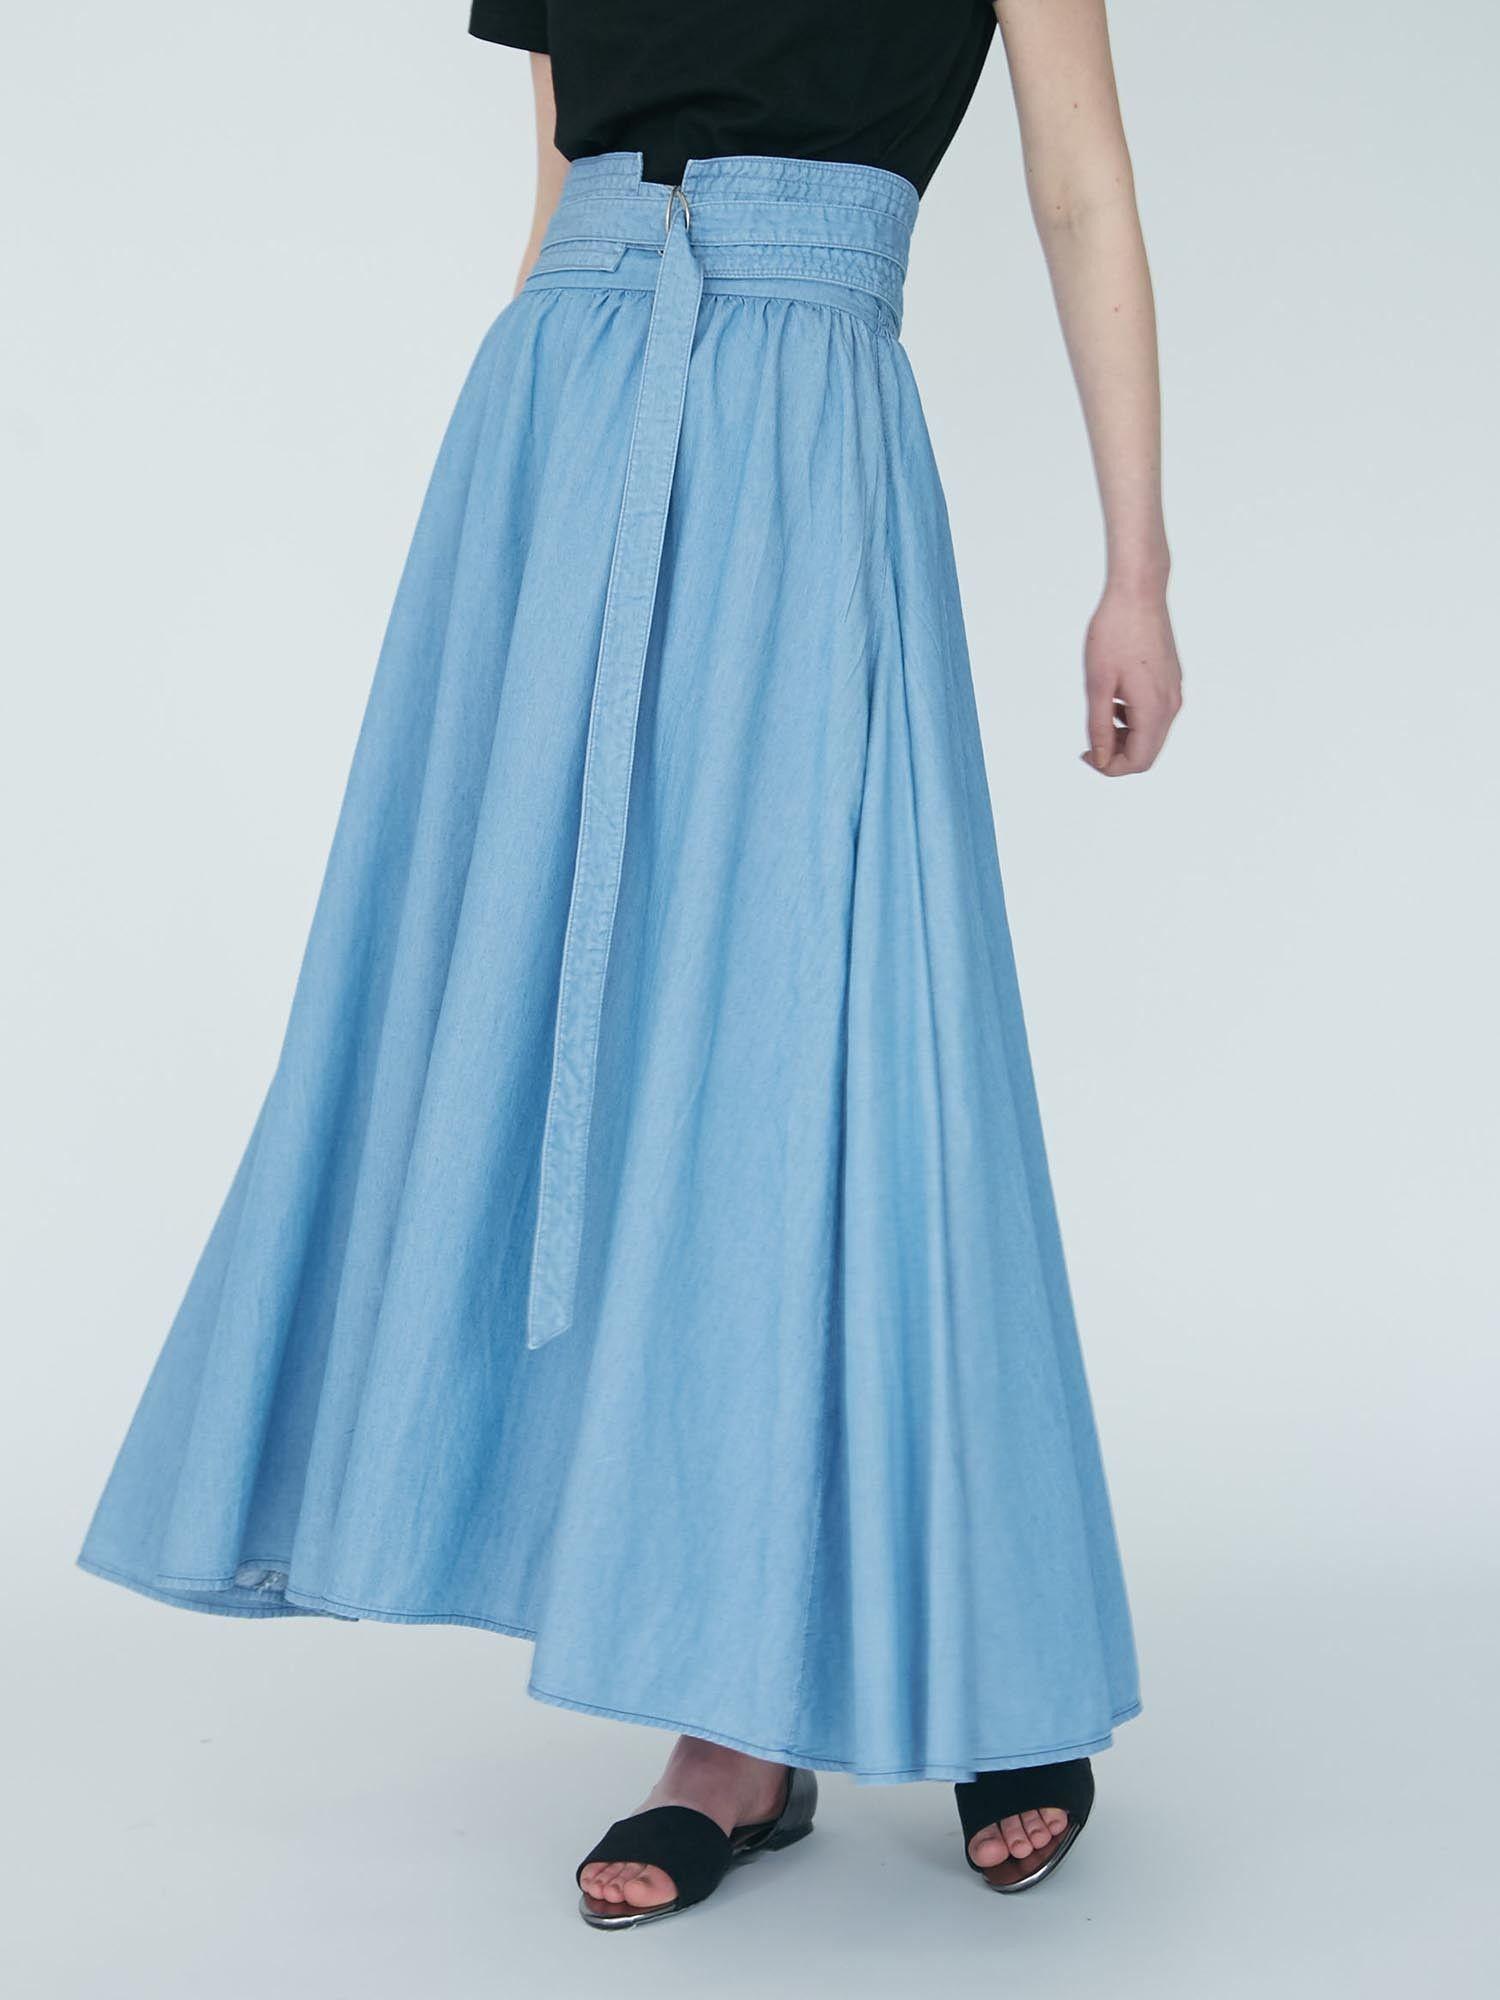 Indigo long skirt